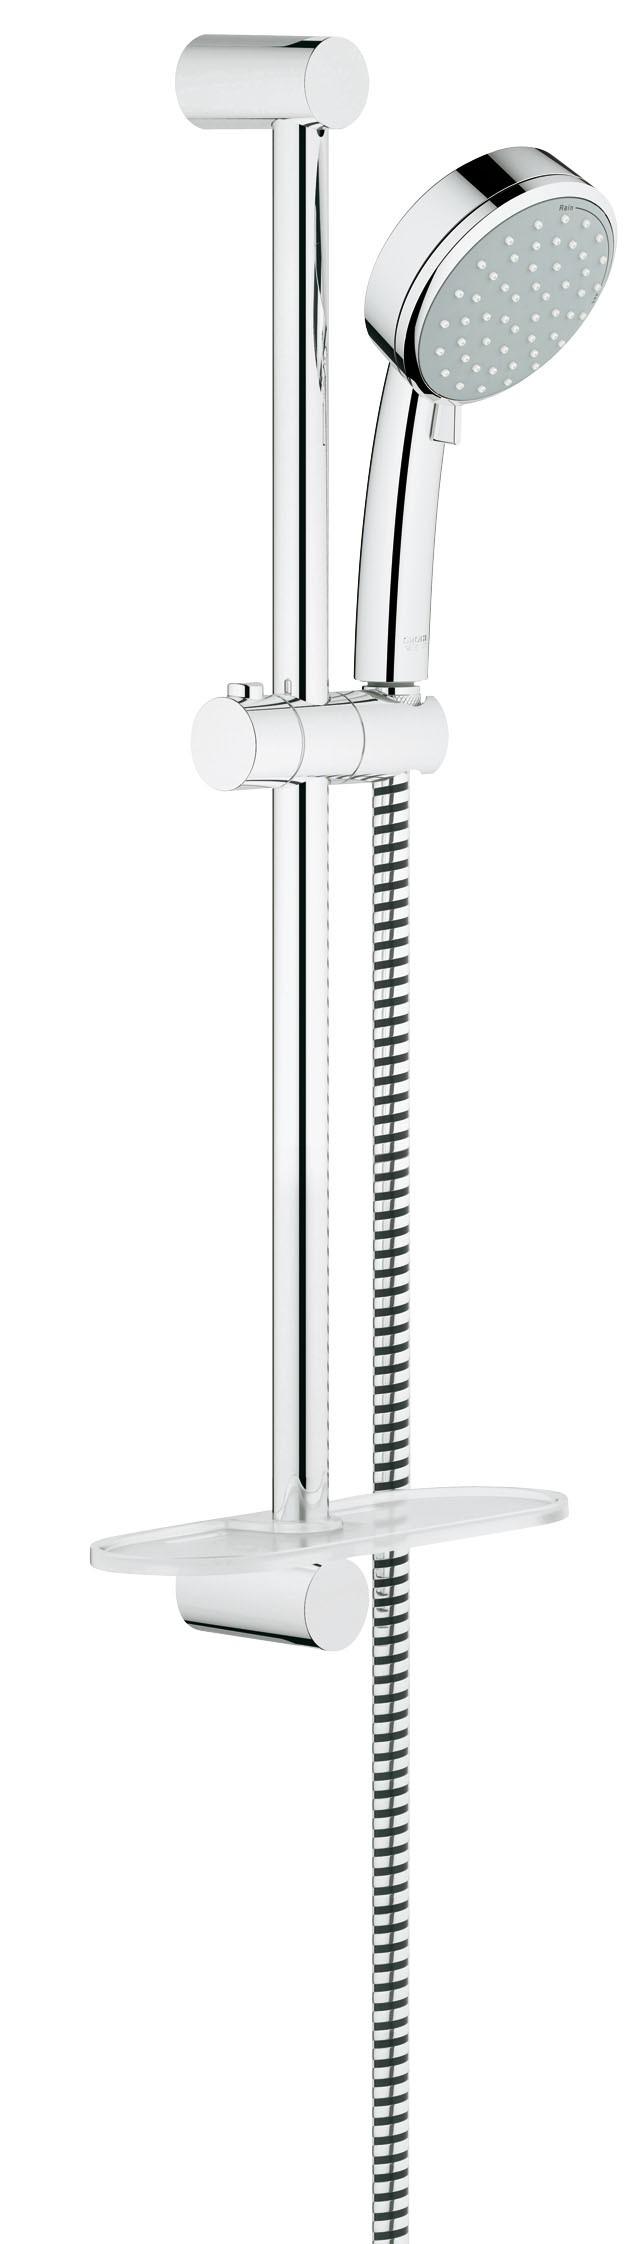 Grohe 27928001 Tempesta Cosmopolitan (ручной душ, штанга 600 мм, шланг 1750 мм), хром